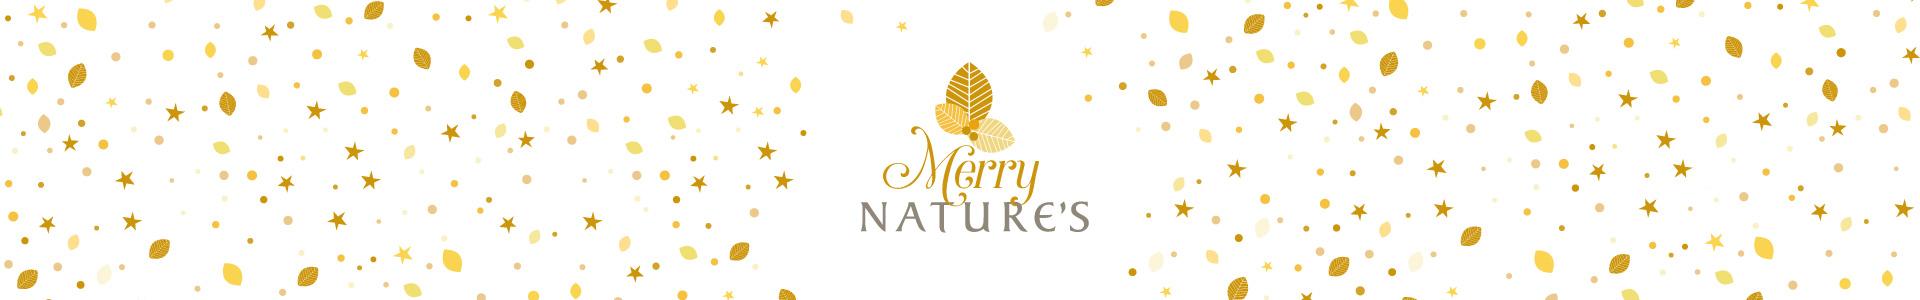 Merry Nature's